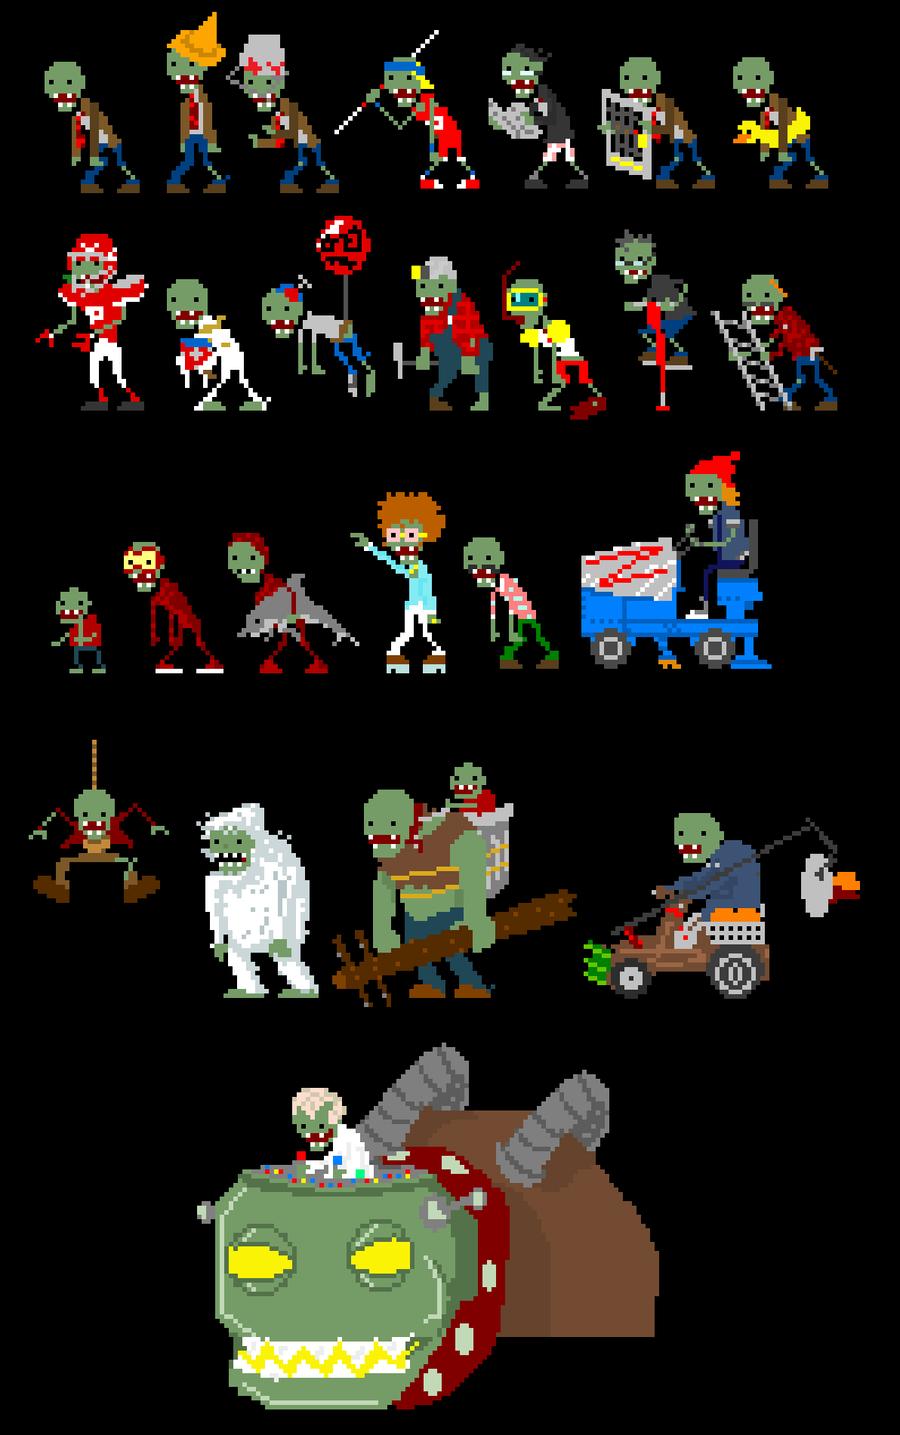 Plants Vs Zombies By Ganando Enemigos On Deviantart